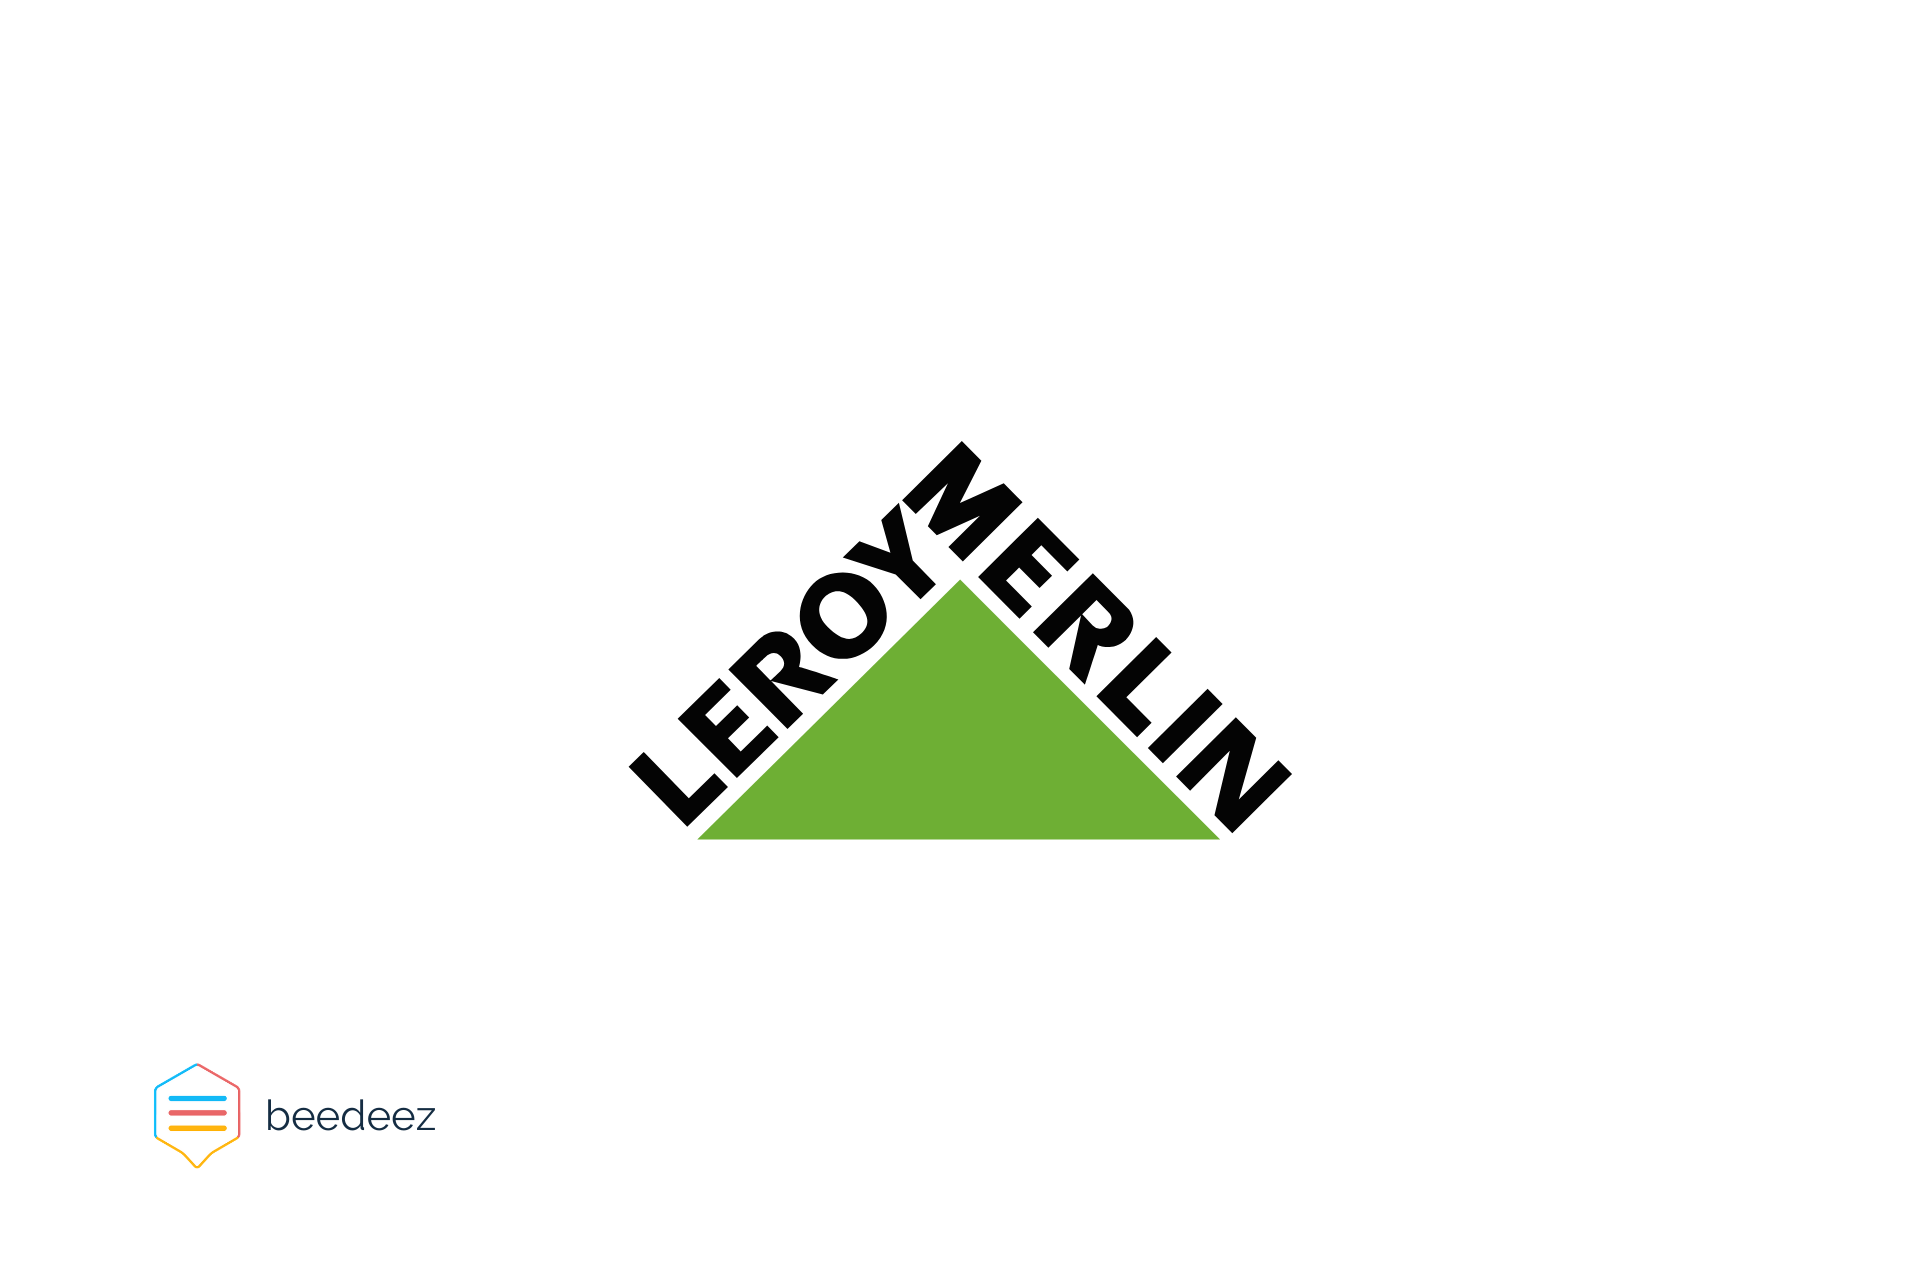 leroy-merlin-cas-client